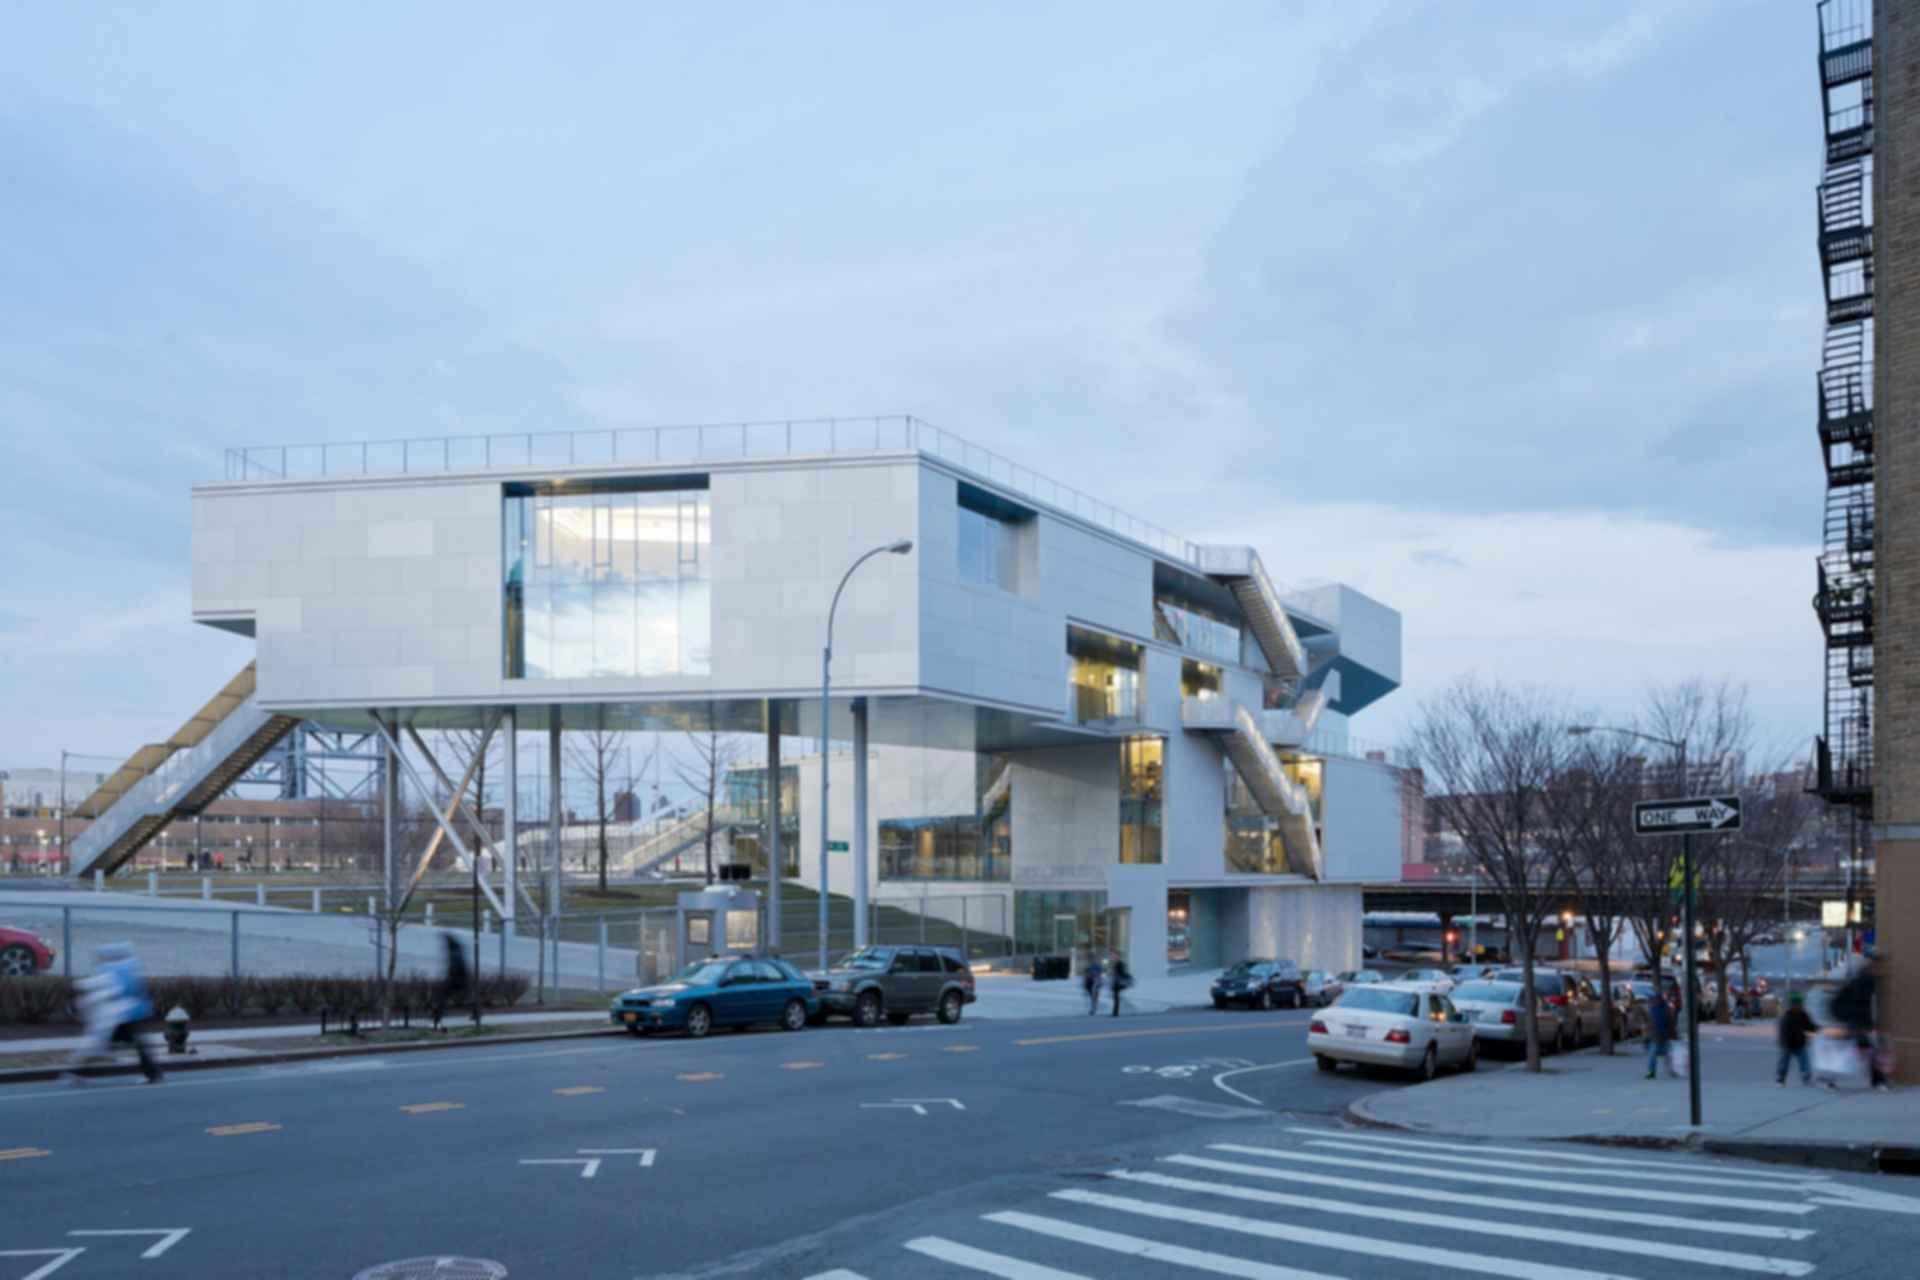 Campbell Sports Center - Exterior/Street View